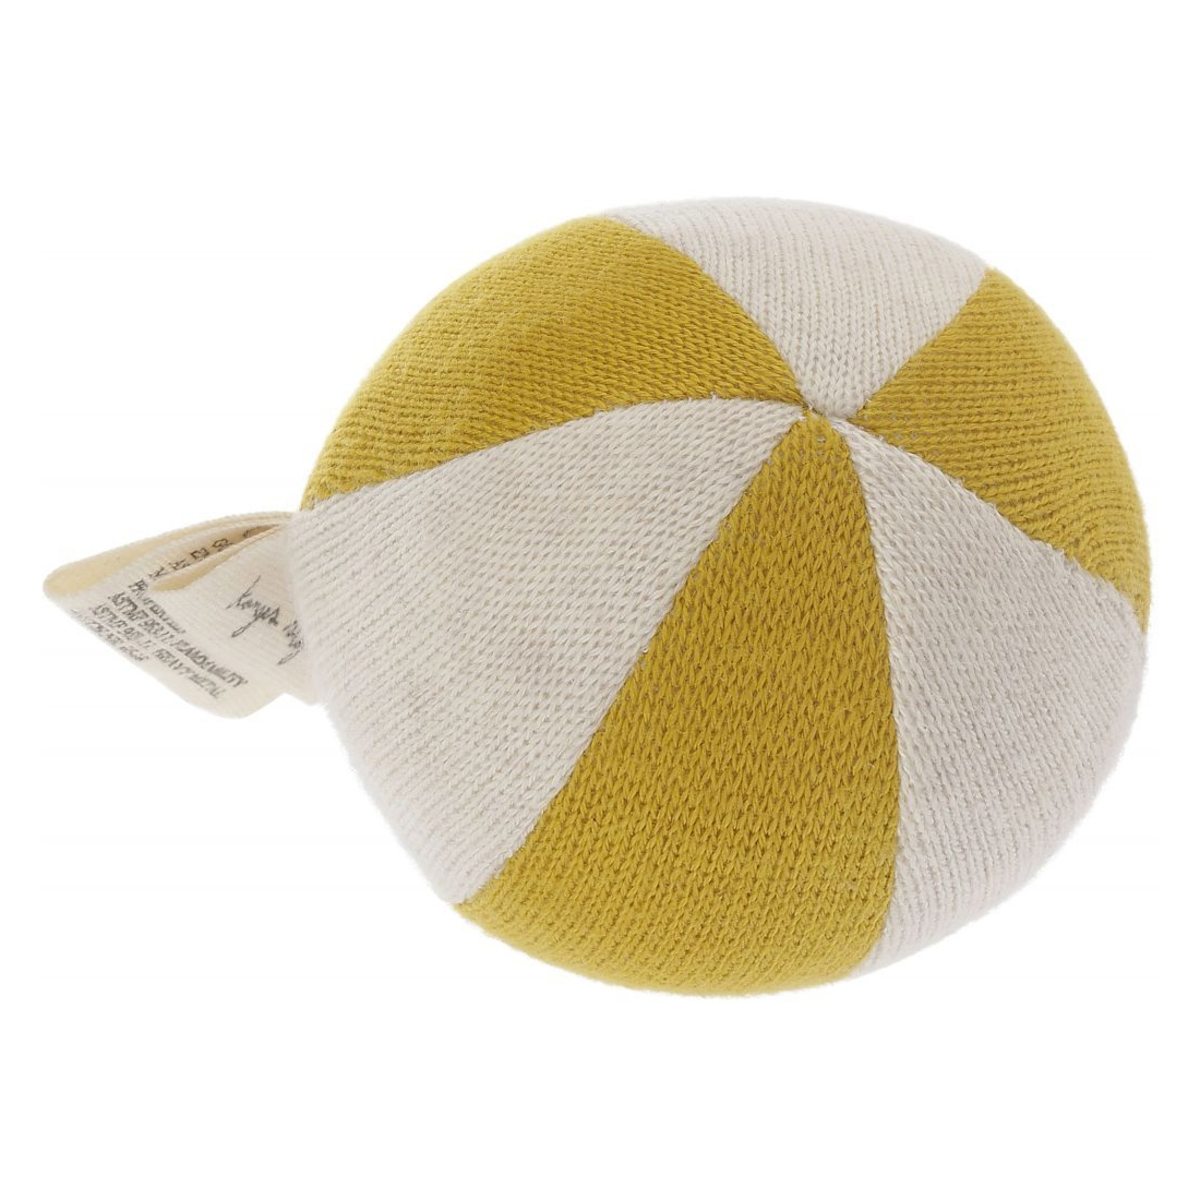 Hochet Hochet Ballon - Moutarde Hochet Ballon - Moutarde